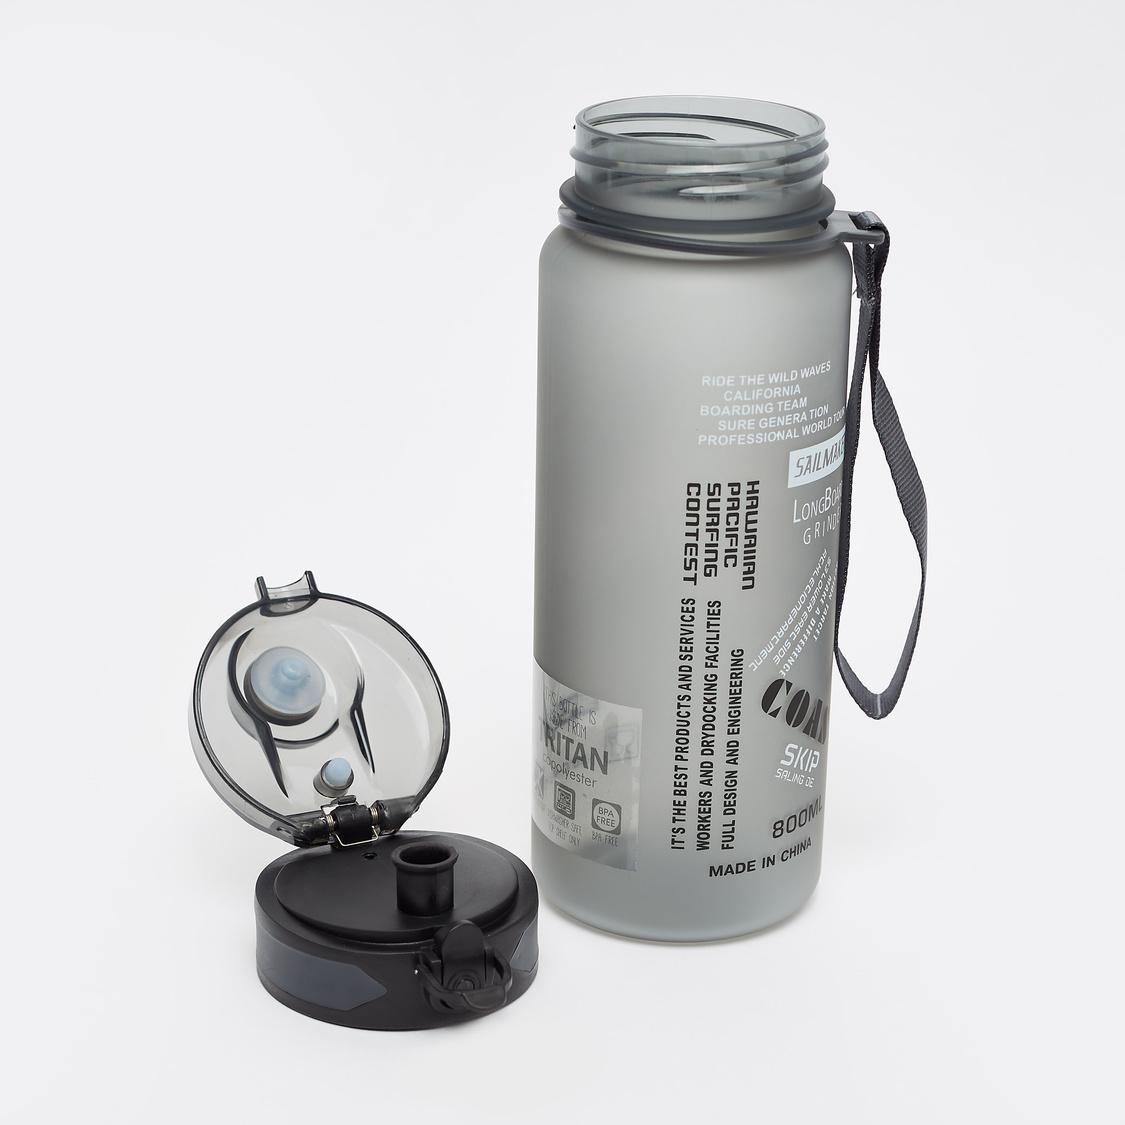 قارورة مياه بغطاء فليب ومقبض وطبعات - 750 مل